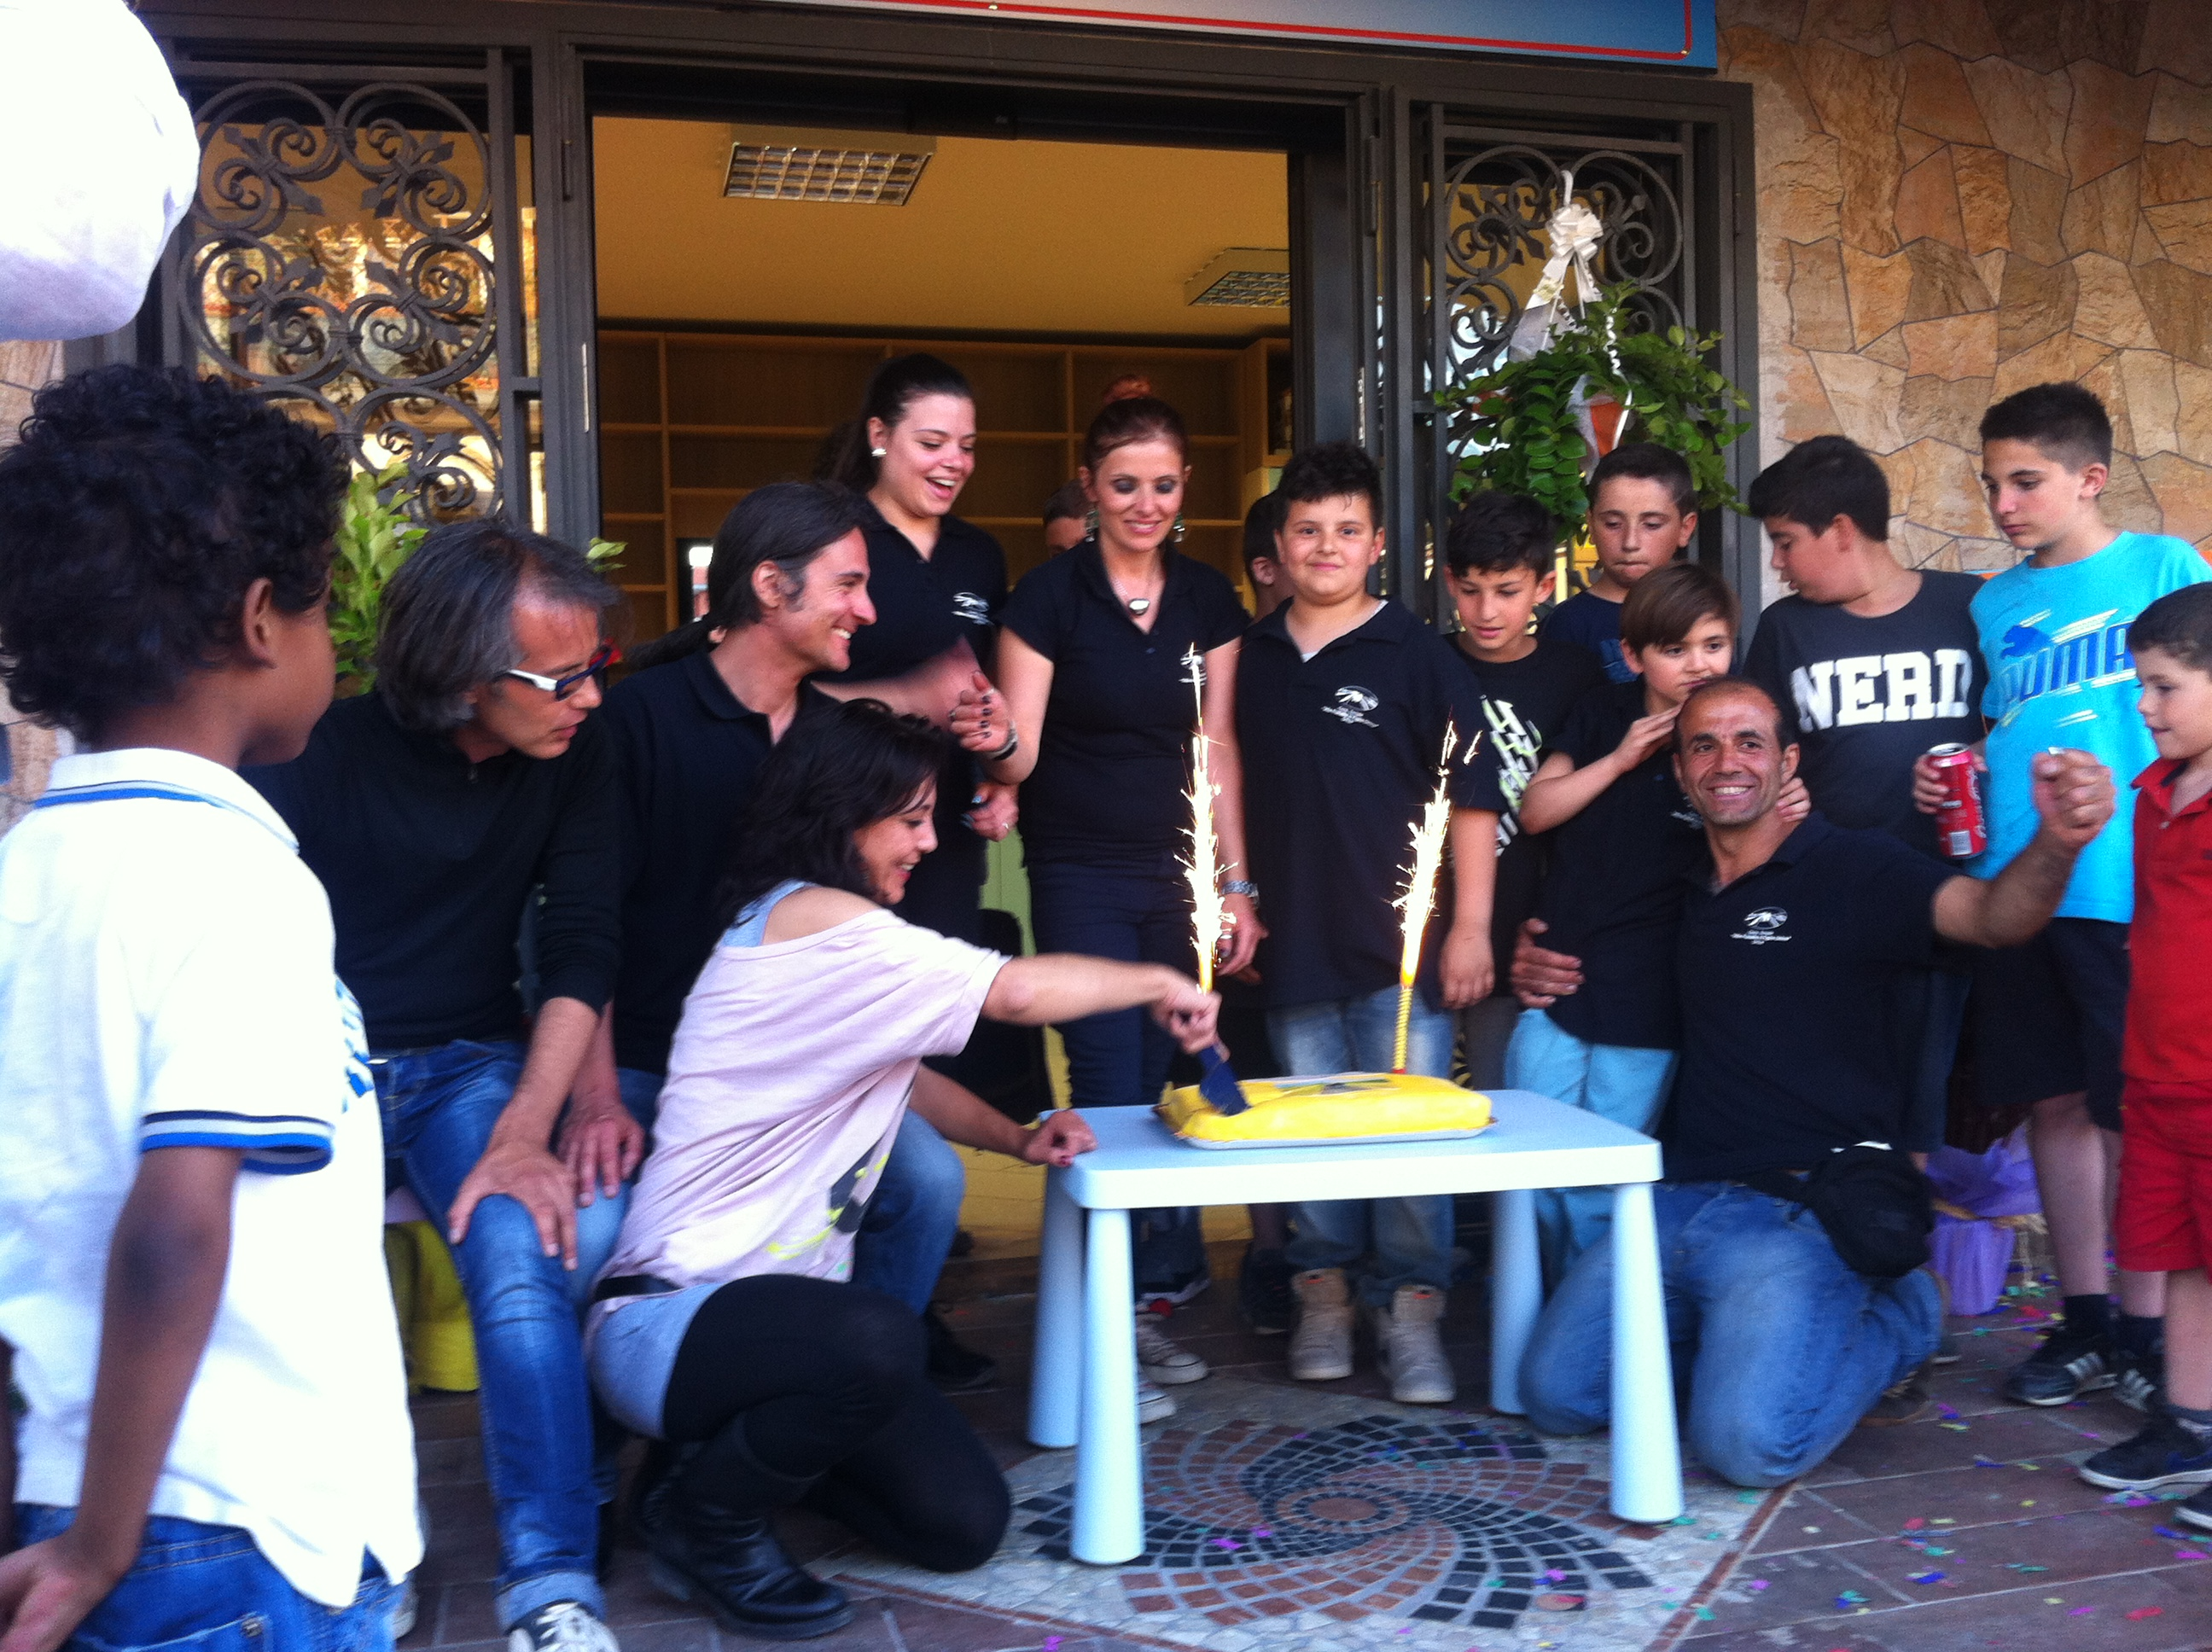 Affitto sala per feste roma massimina miofratellofigliounico for Affitto sala roma